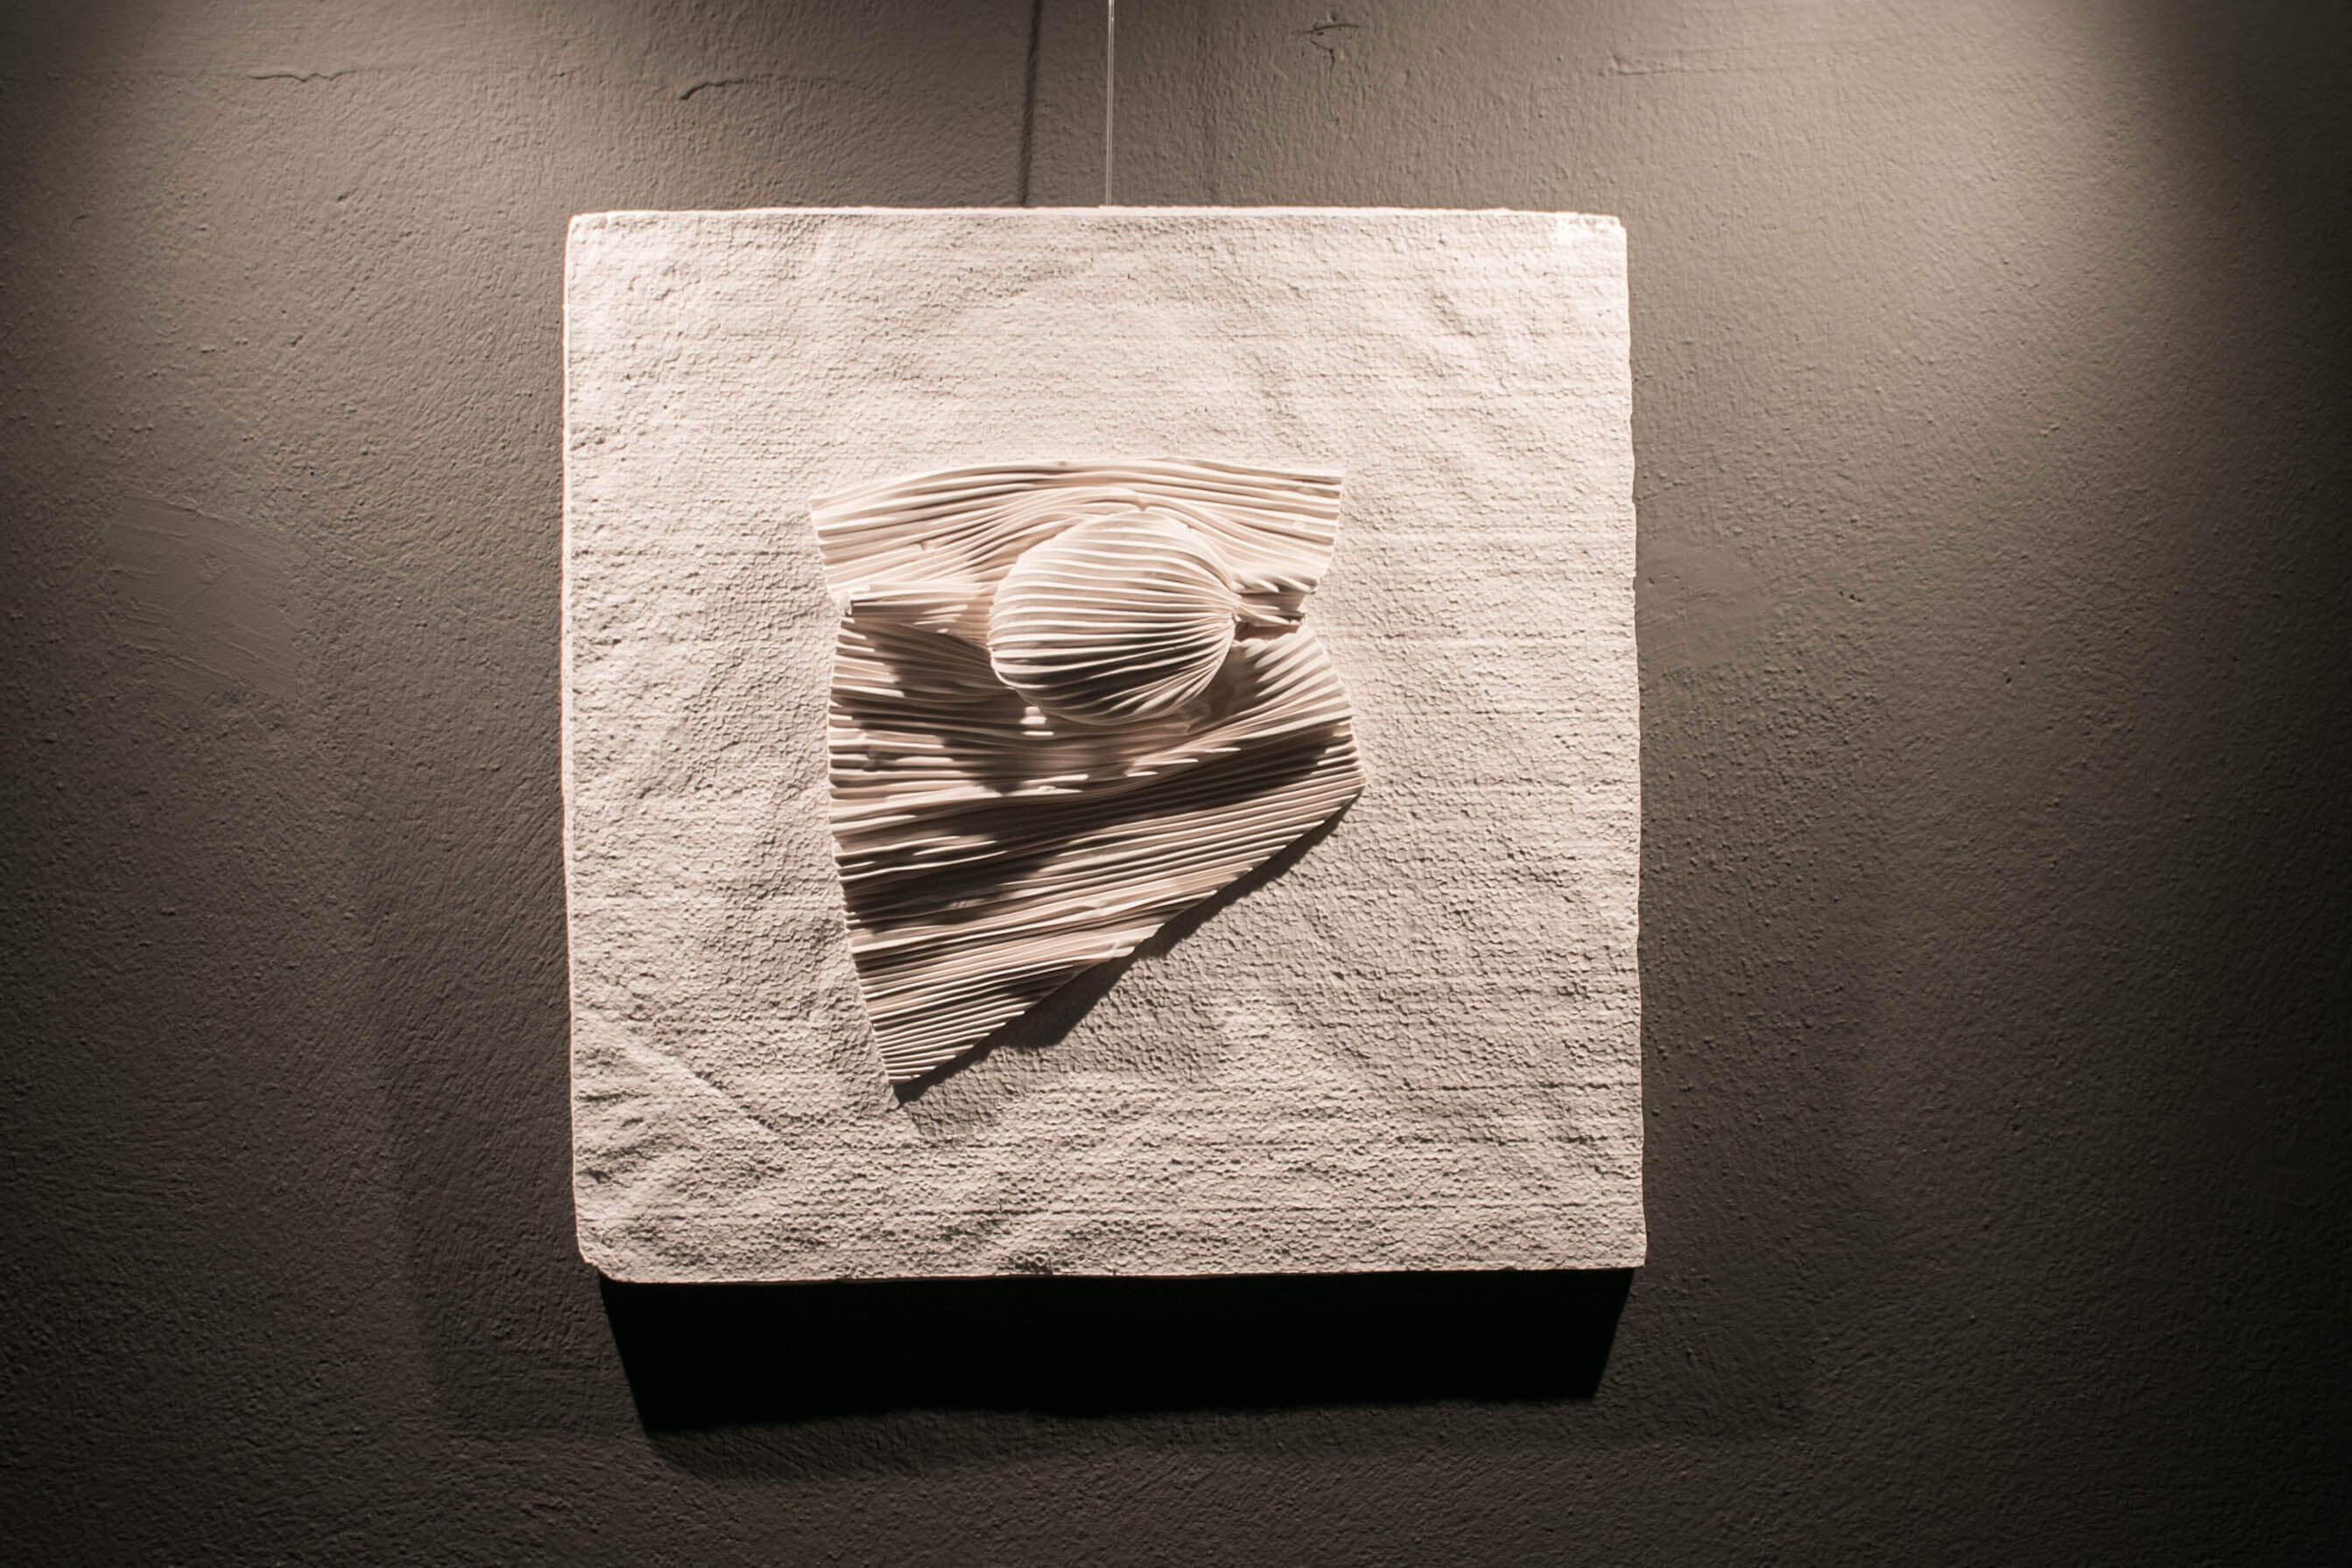 ripple_Meenan_art_relief_sculpture_IMG_2435.jpg